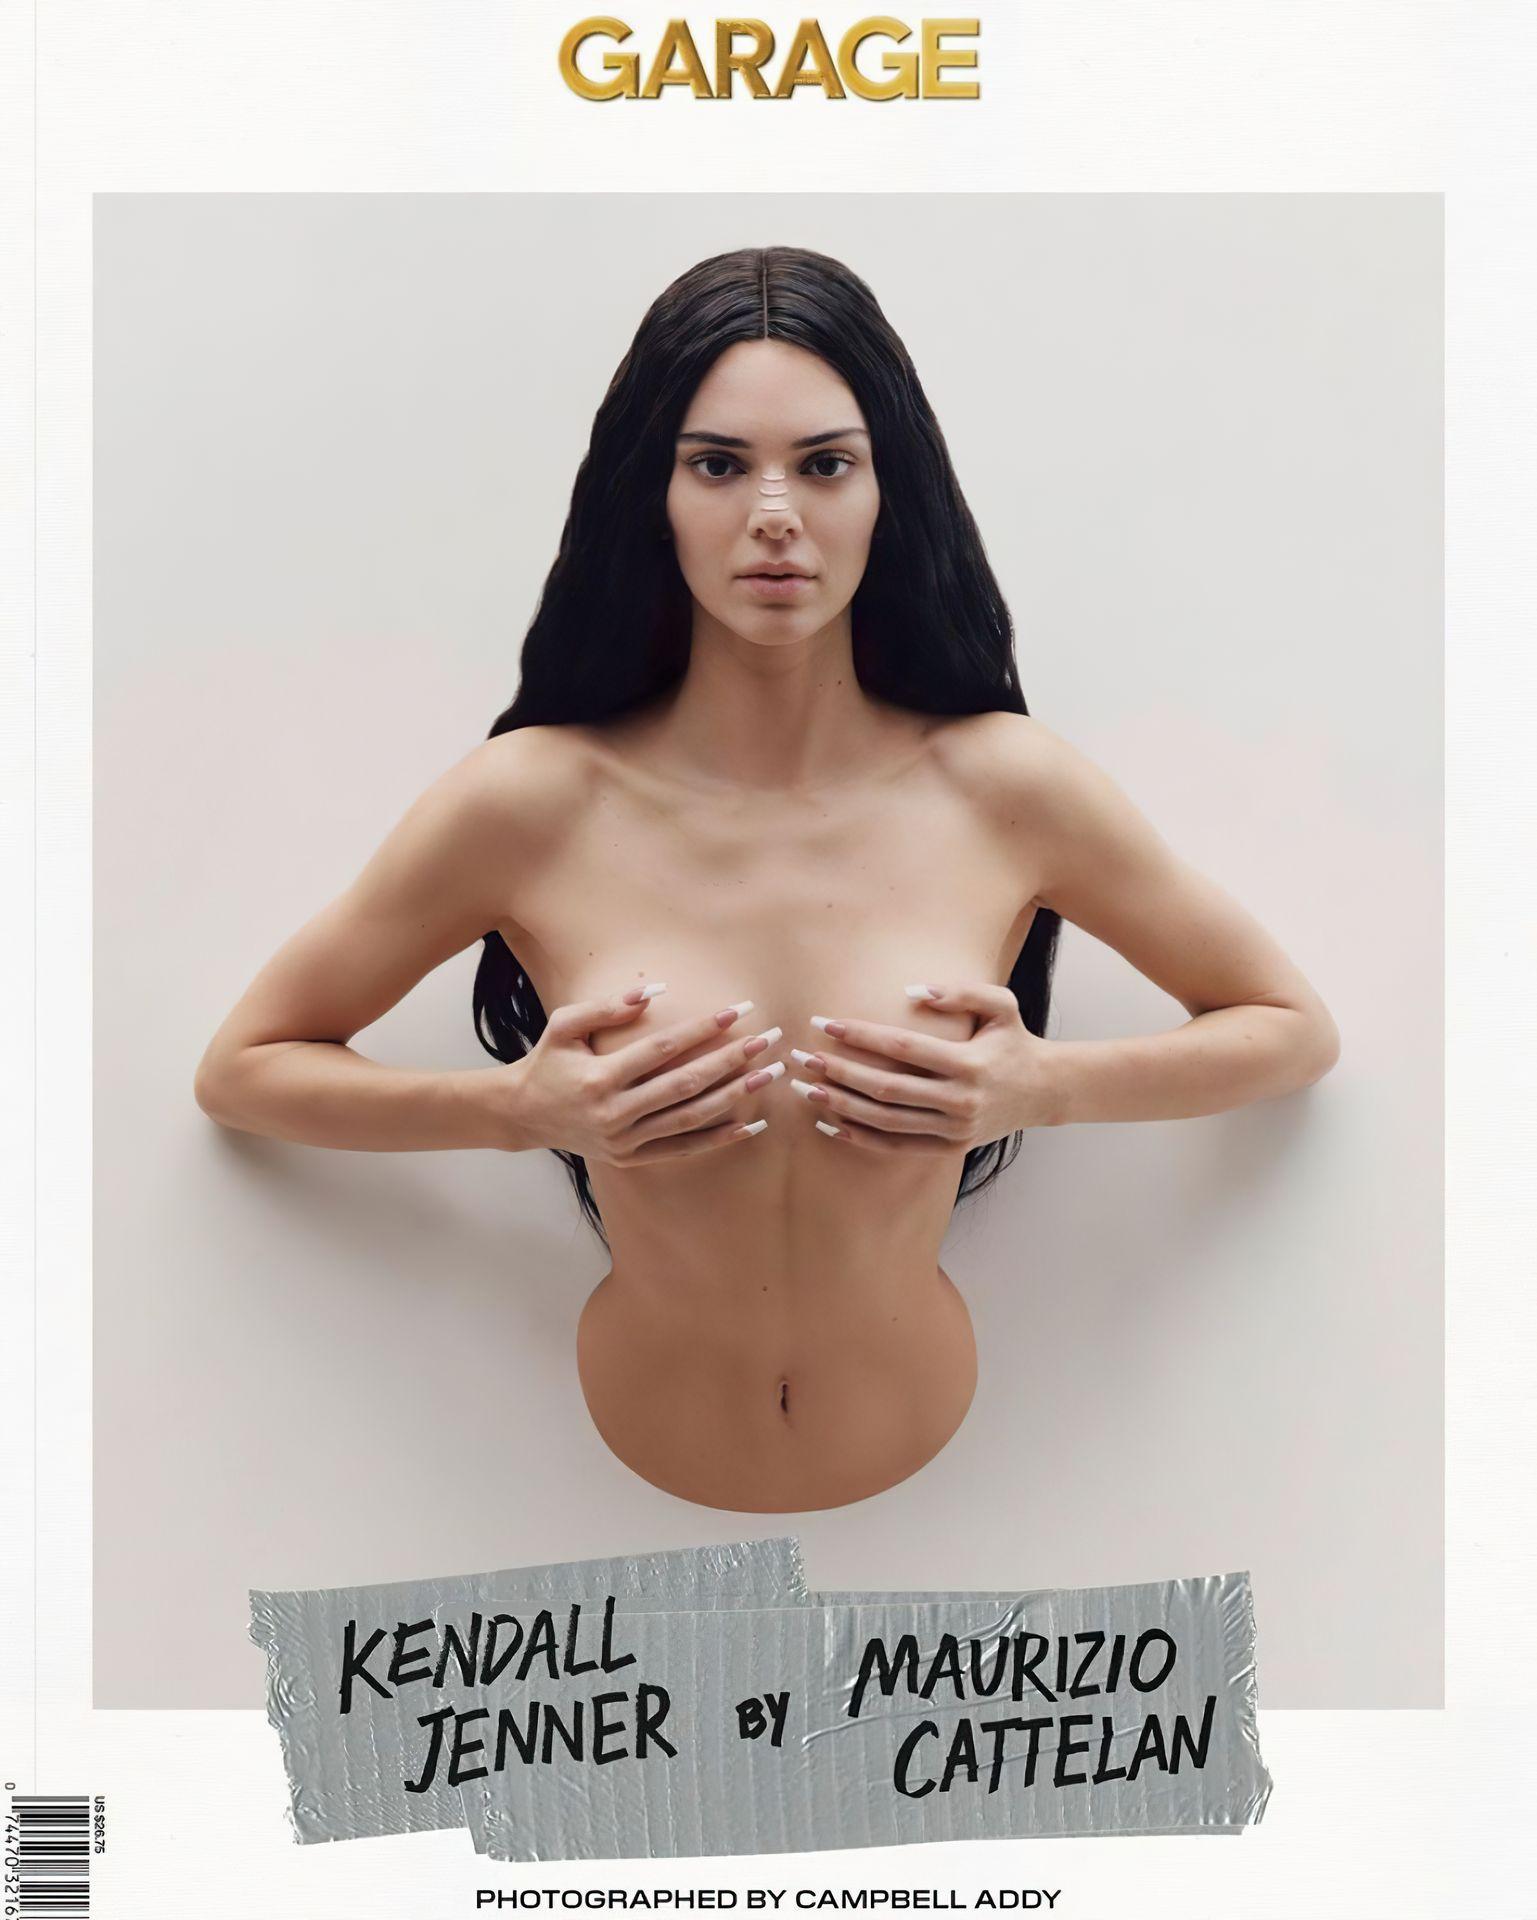 Kendall Jenner Sexy & Topless – Garage Magazine 0001